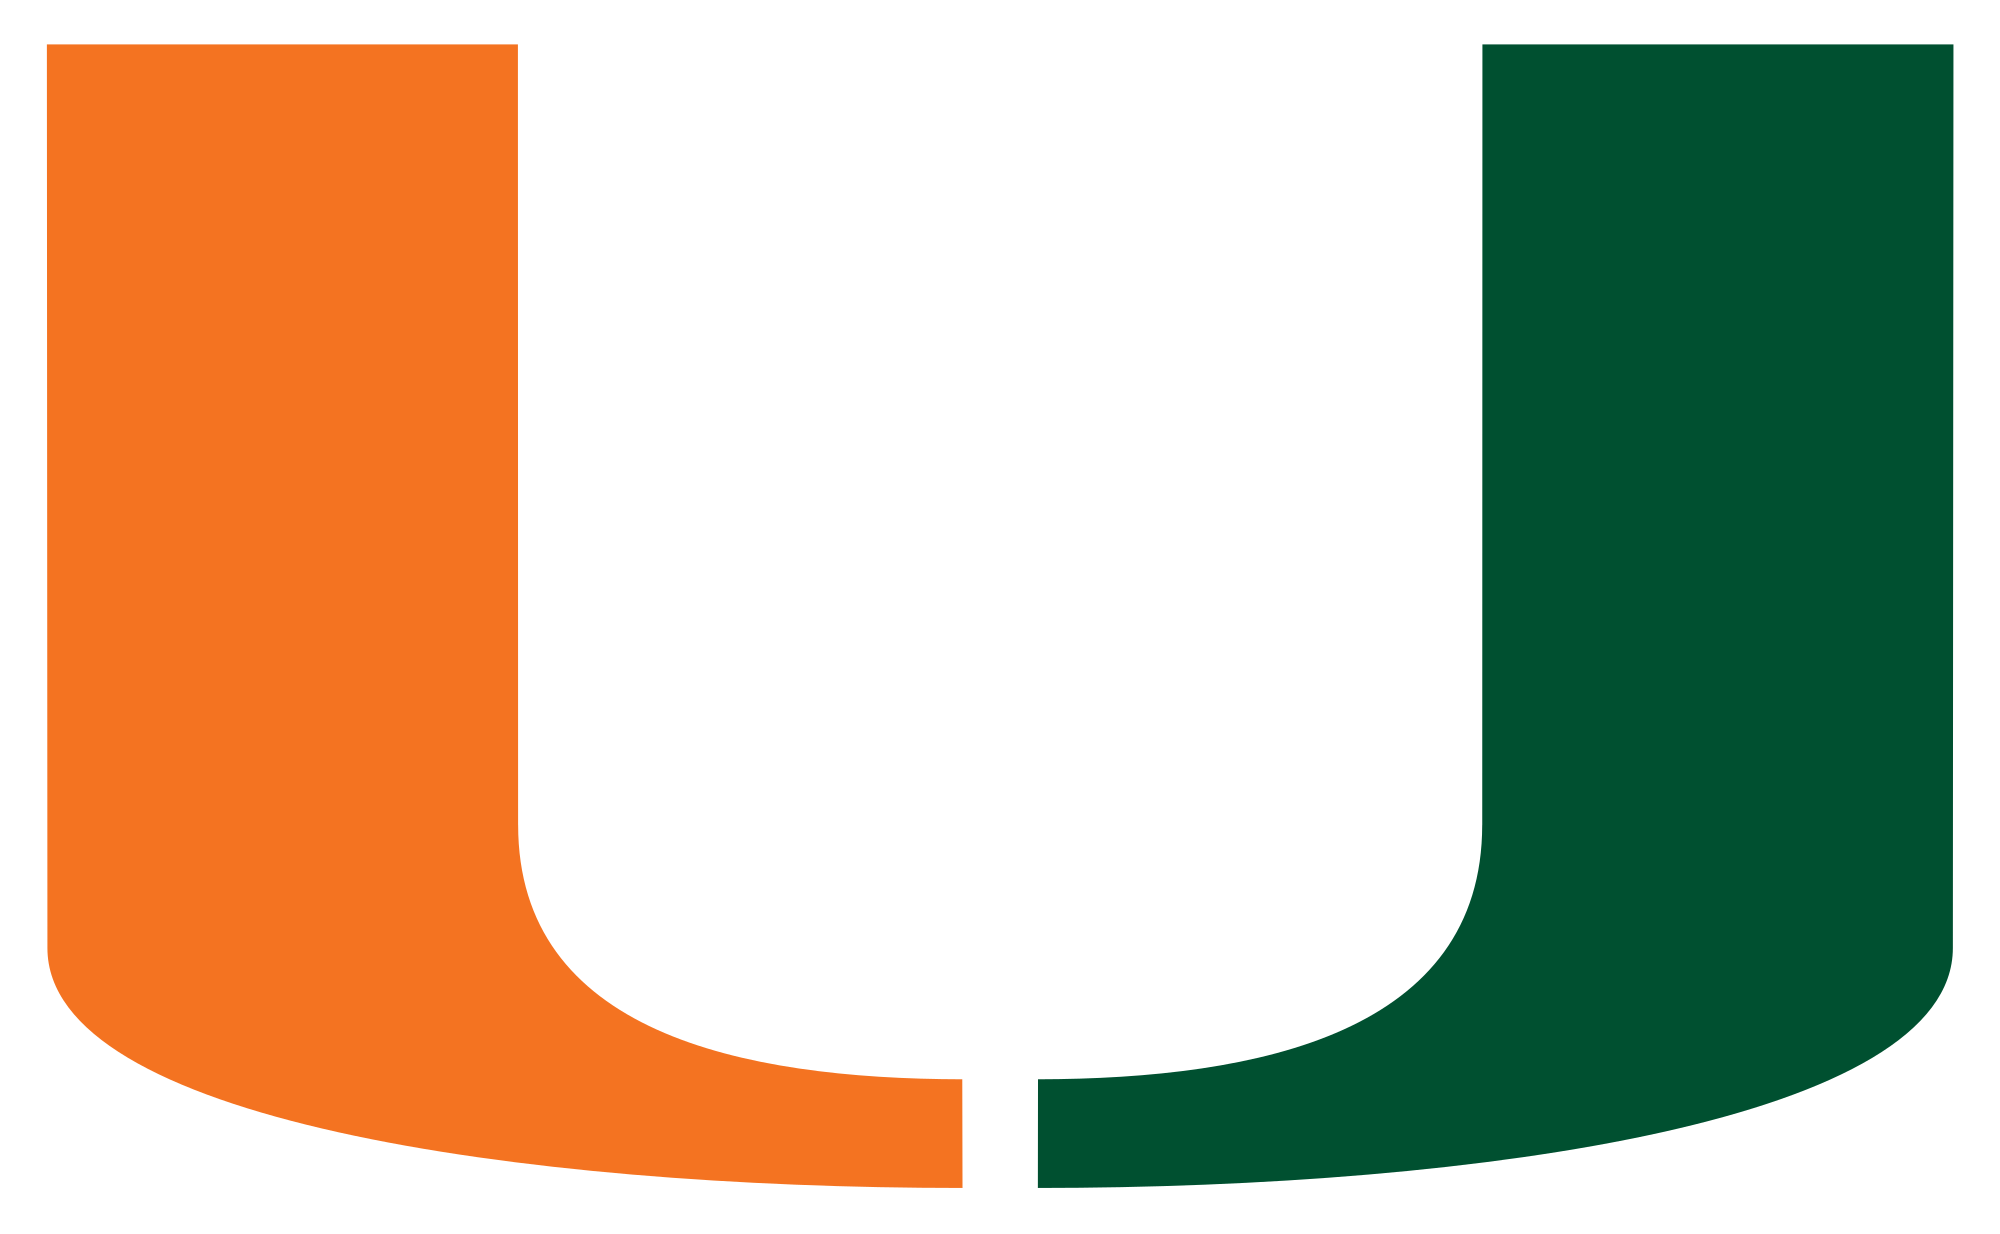 Basketball bounce clipart vector royalty free library File:Miami Hurricanes logo.svg - Wikimedia Commons vector royalty free library